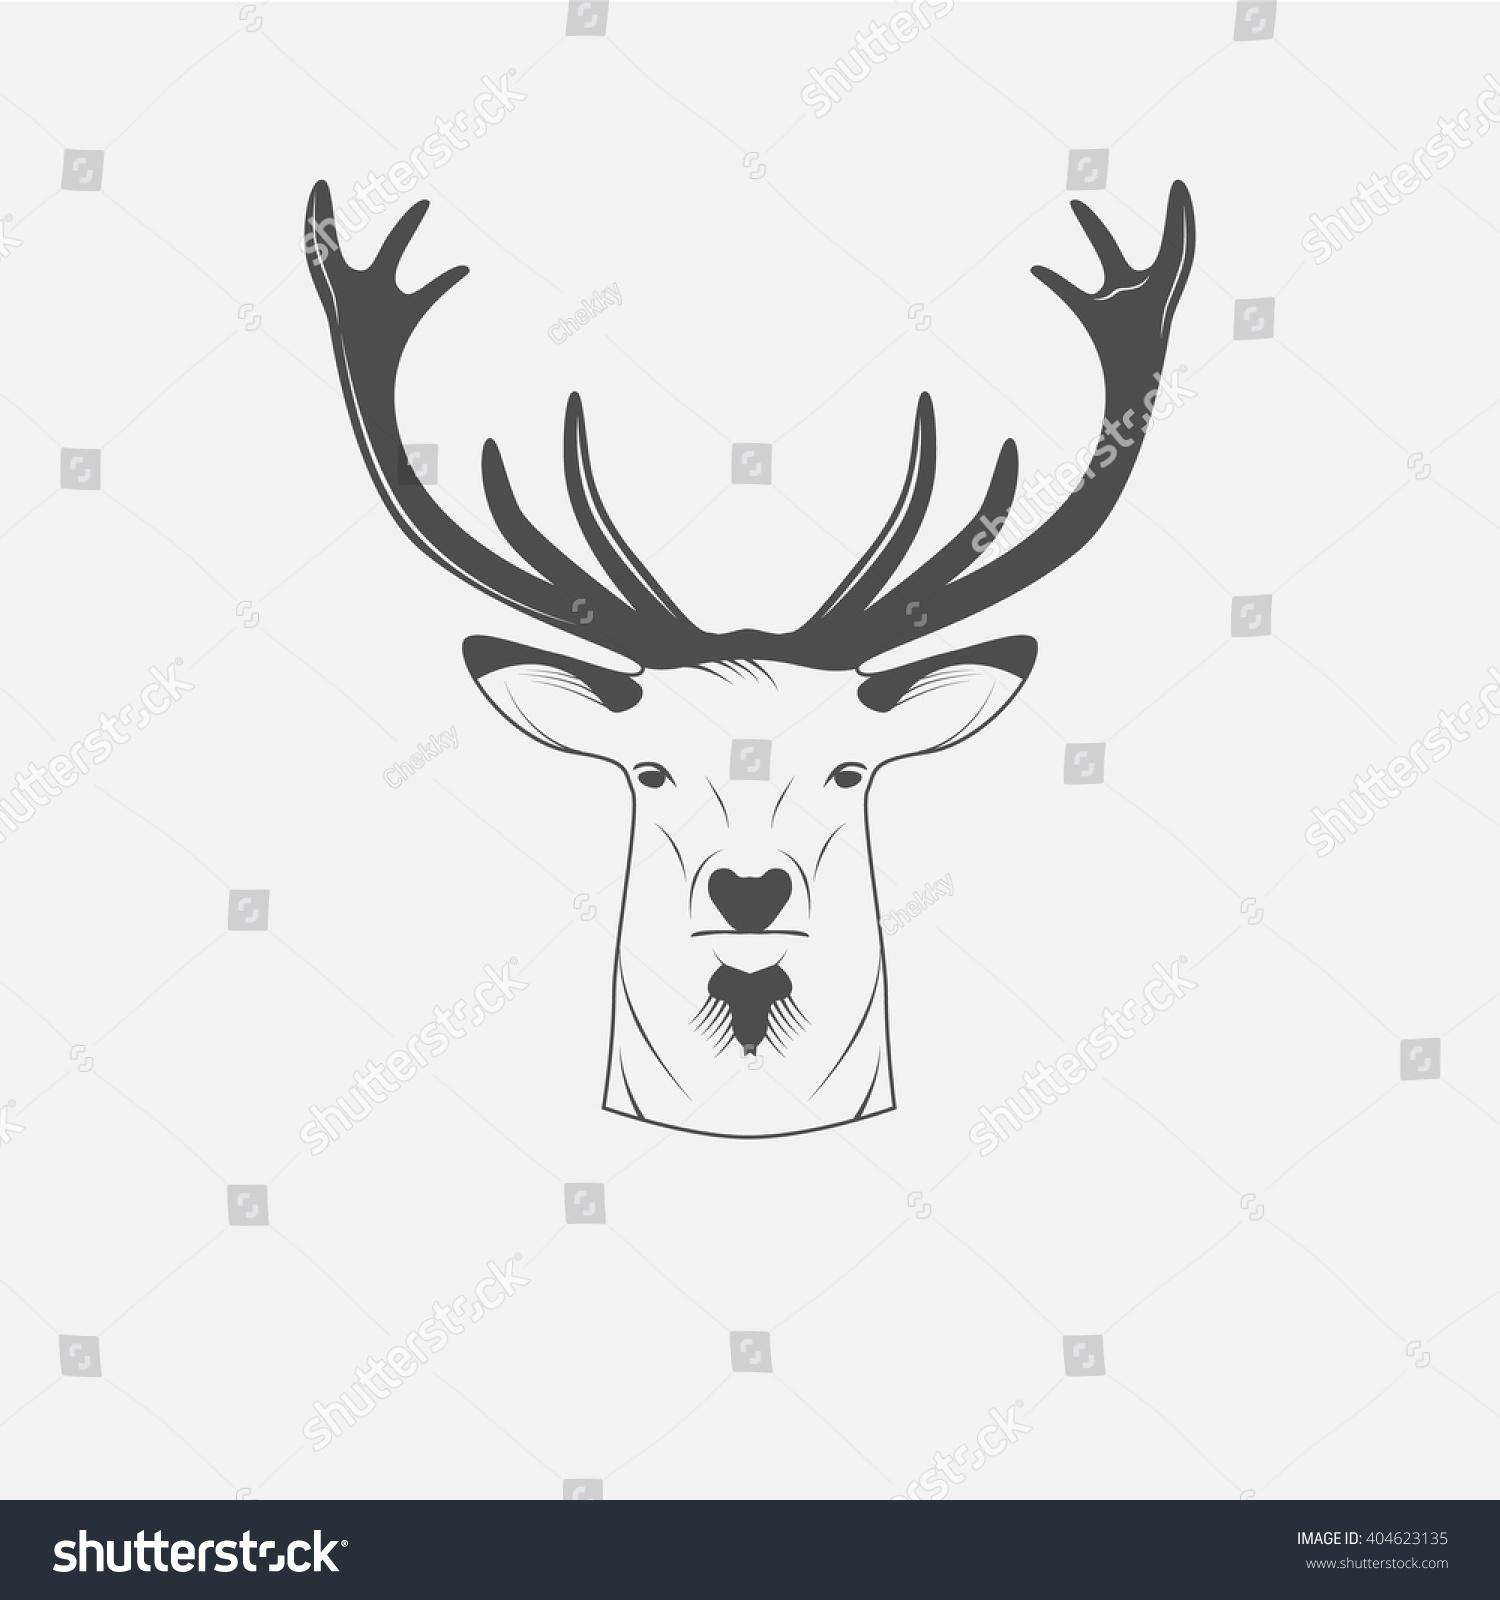 Deer illustration black and white - photo#7